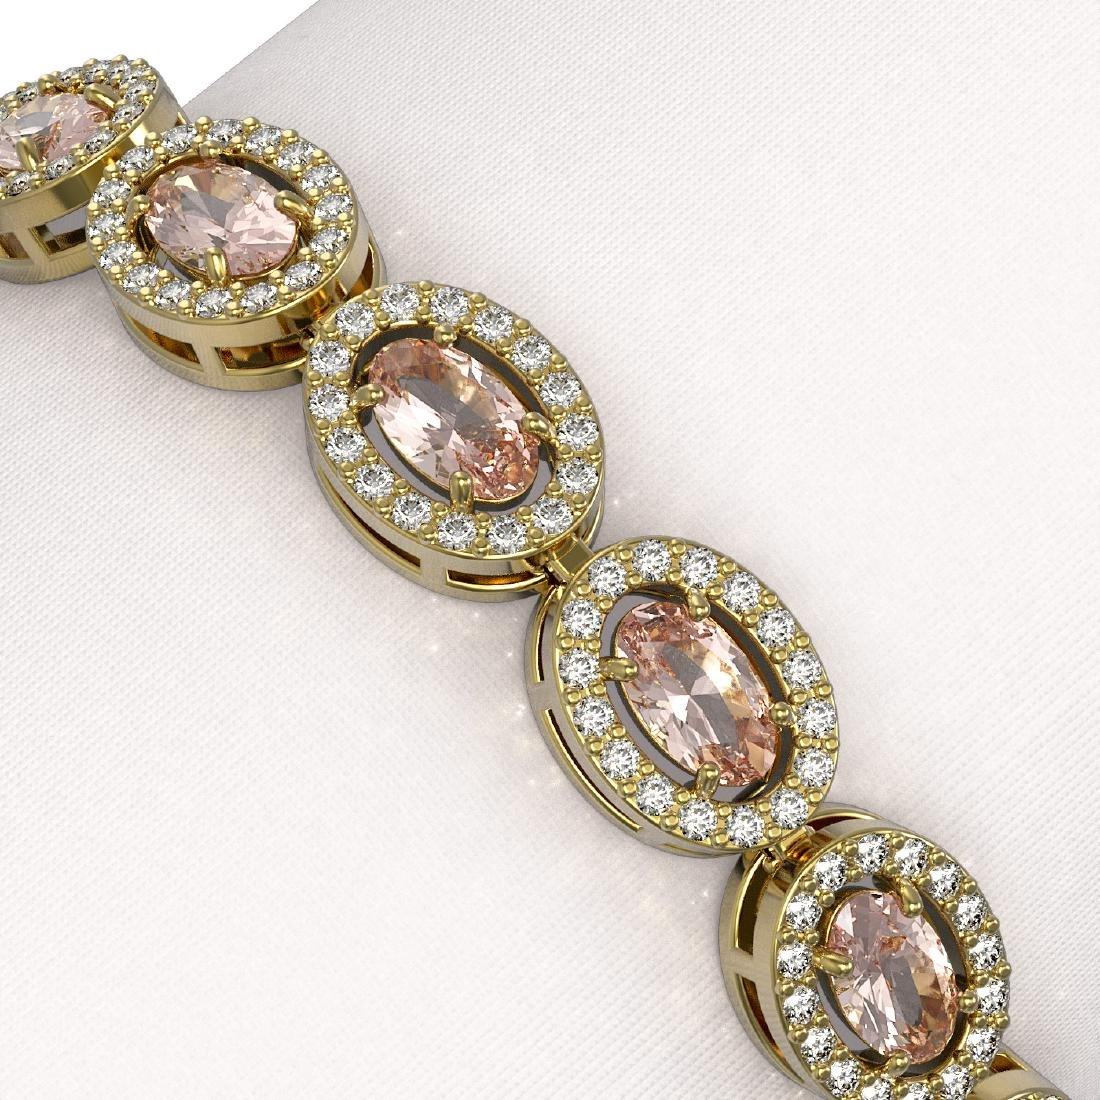 10.48 CTW Morganite & Diamond Halo Bracelet 10K Yellow - 3